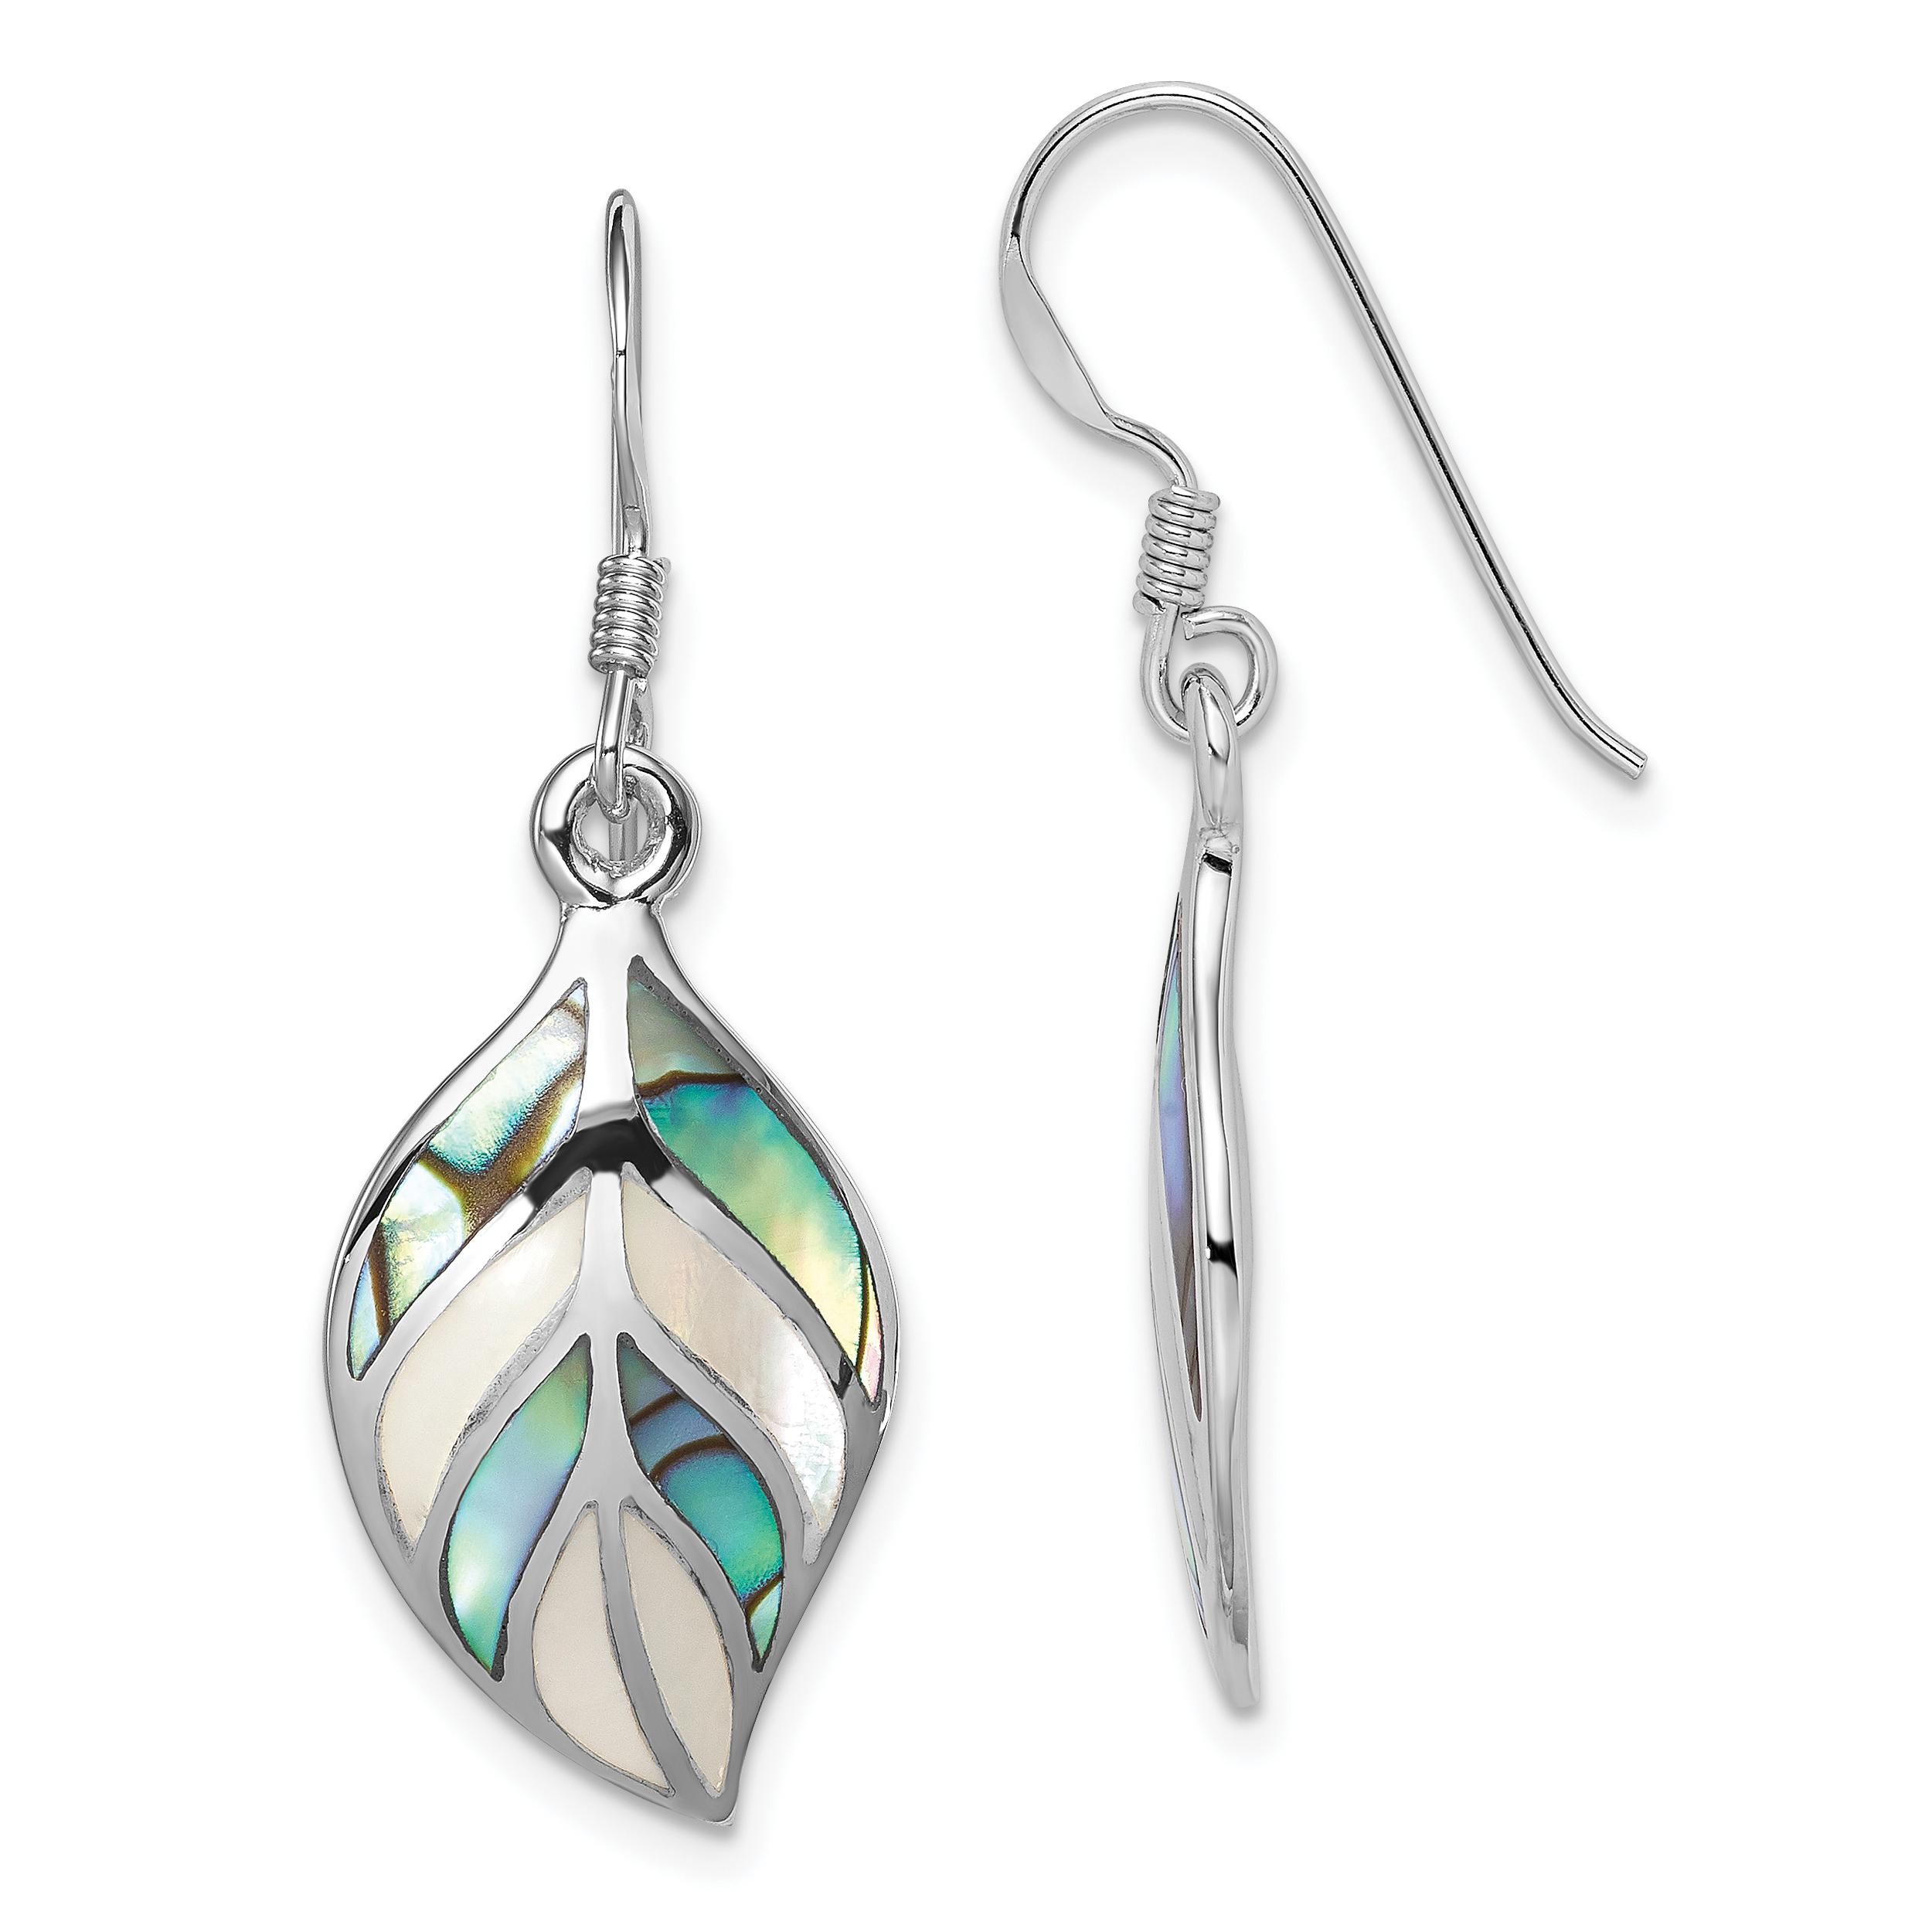 925 Sterling Silver Leaf Mop Abalone Drop Dangle Chandelier Earrings Gifts For Women For Her